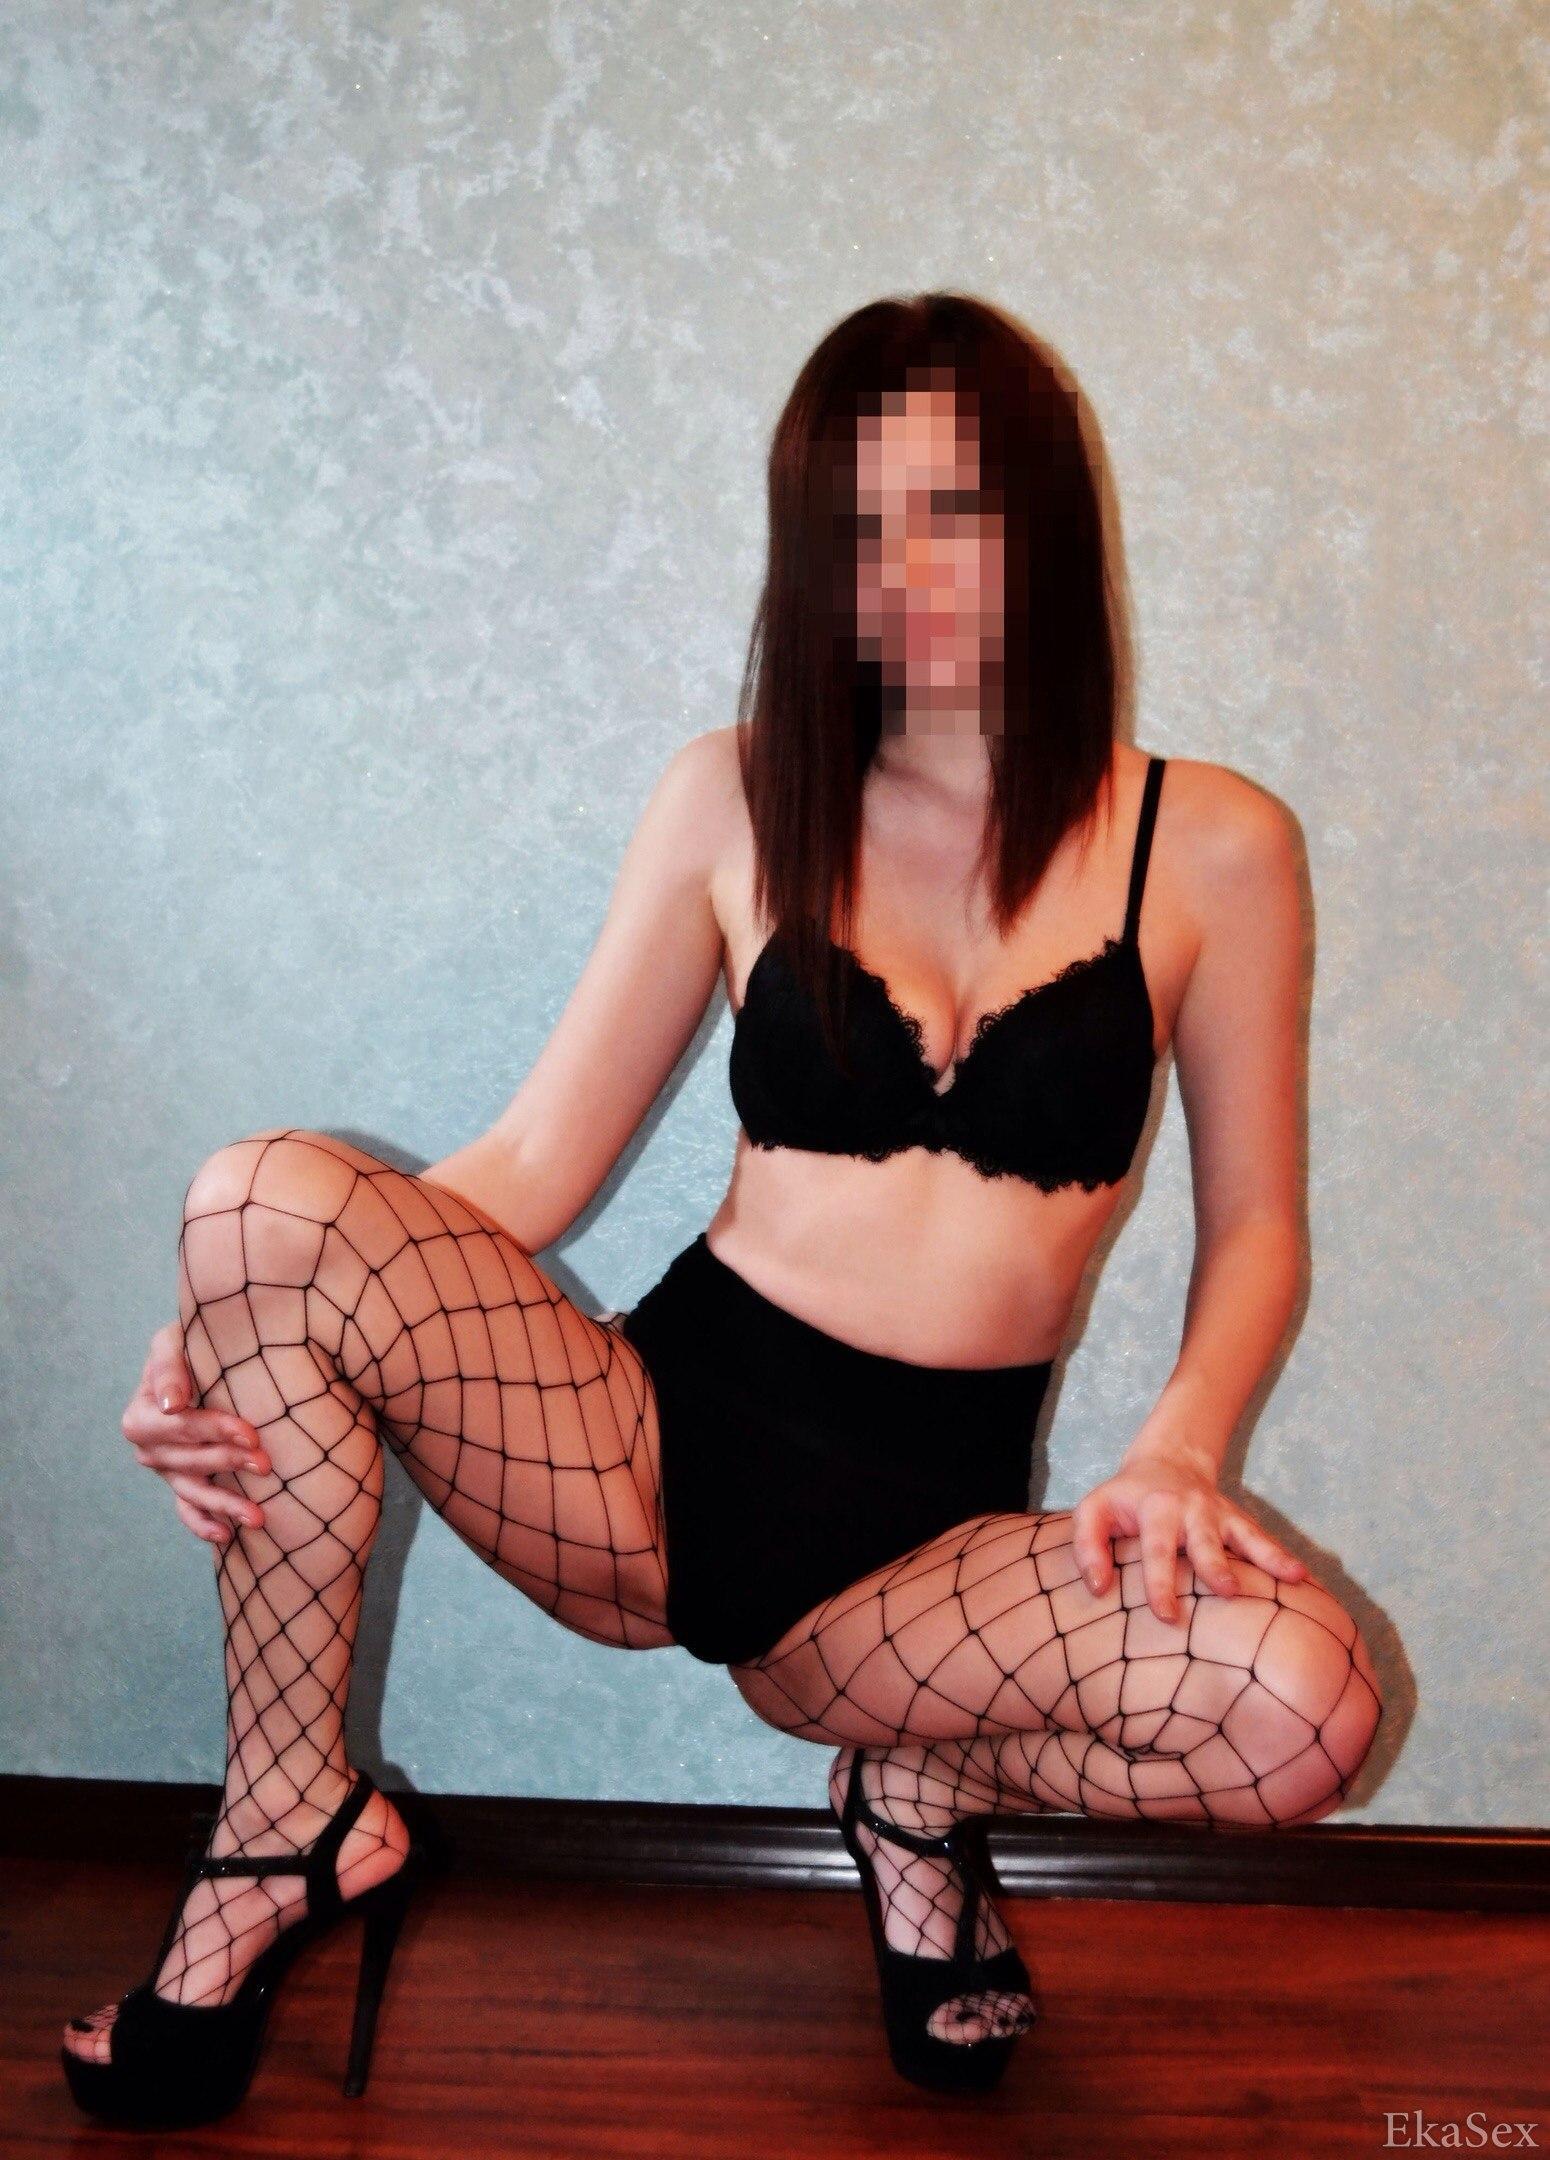 фото проститутки Оксана из города Екатеринбург